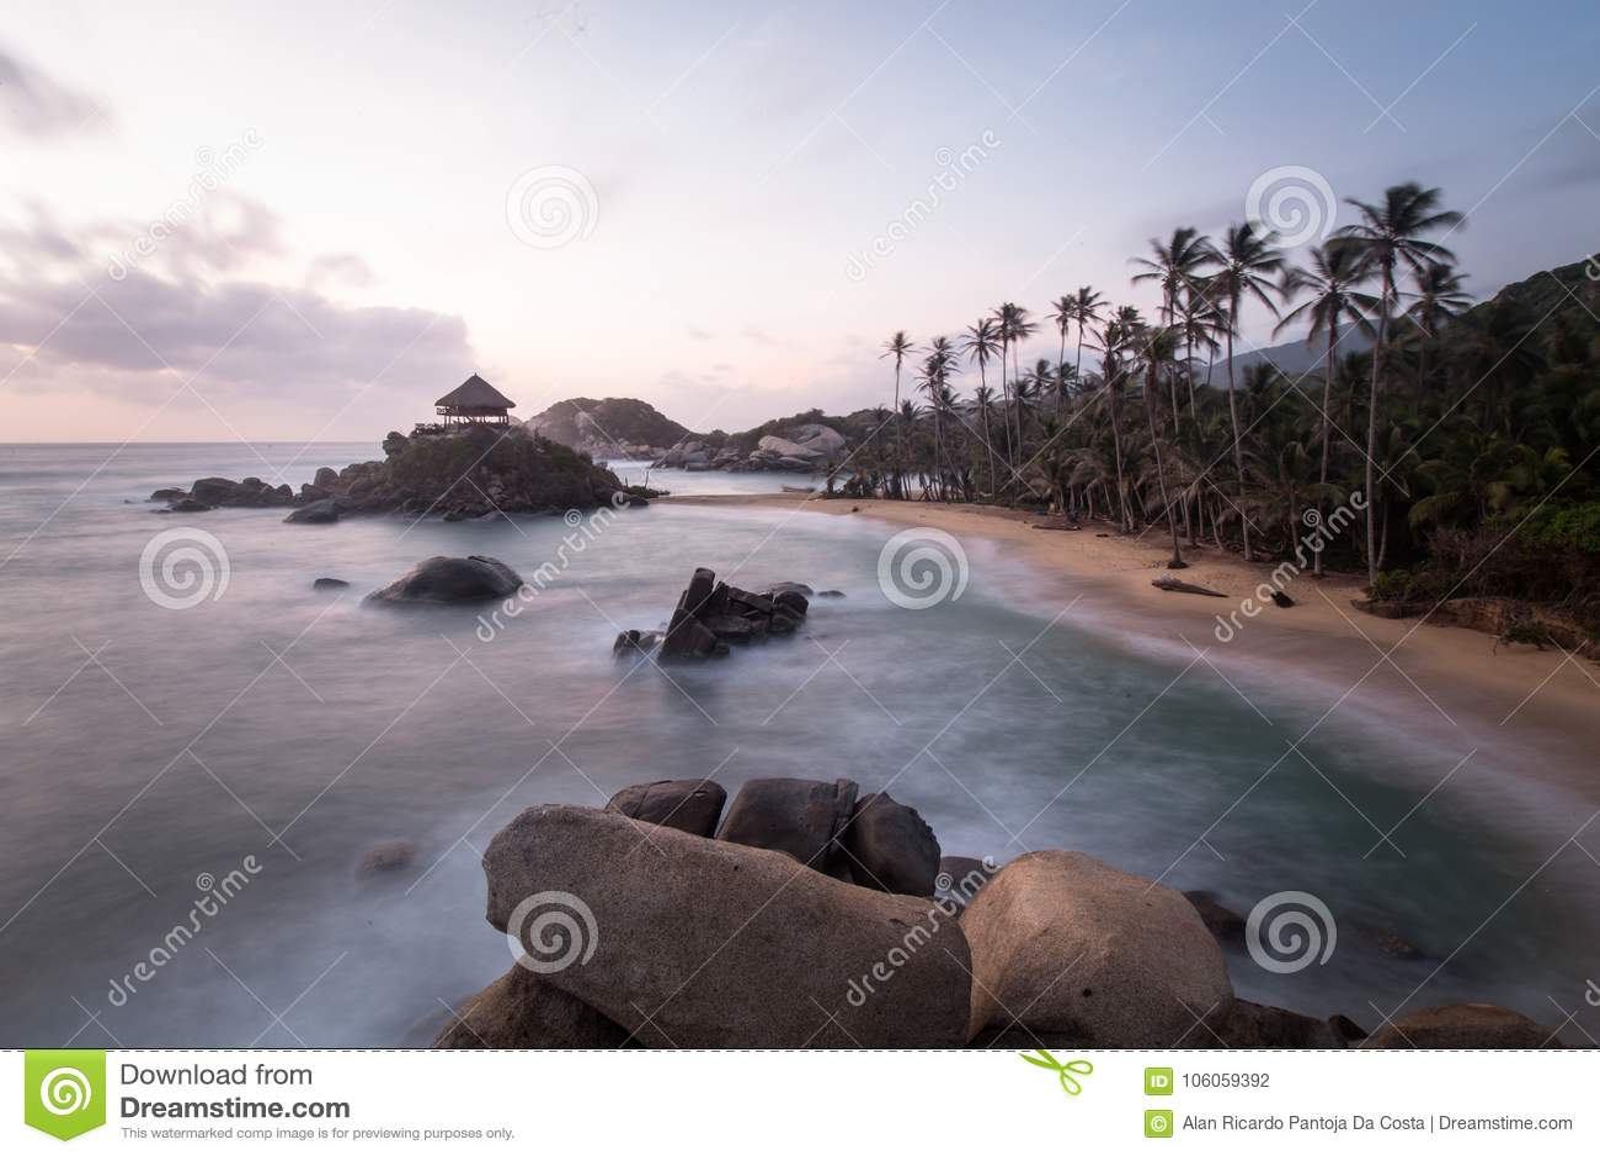 Sunrise in beach in Colombia, Caribe